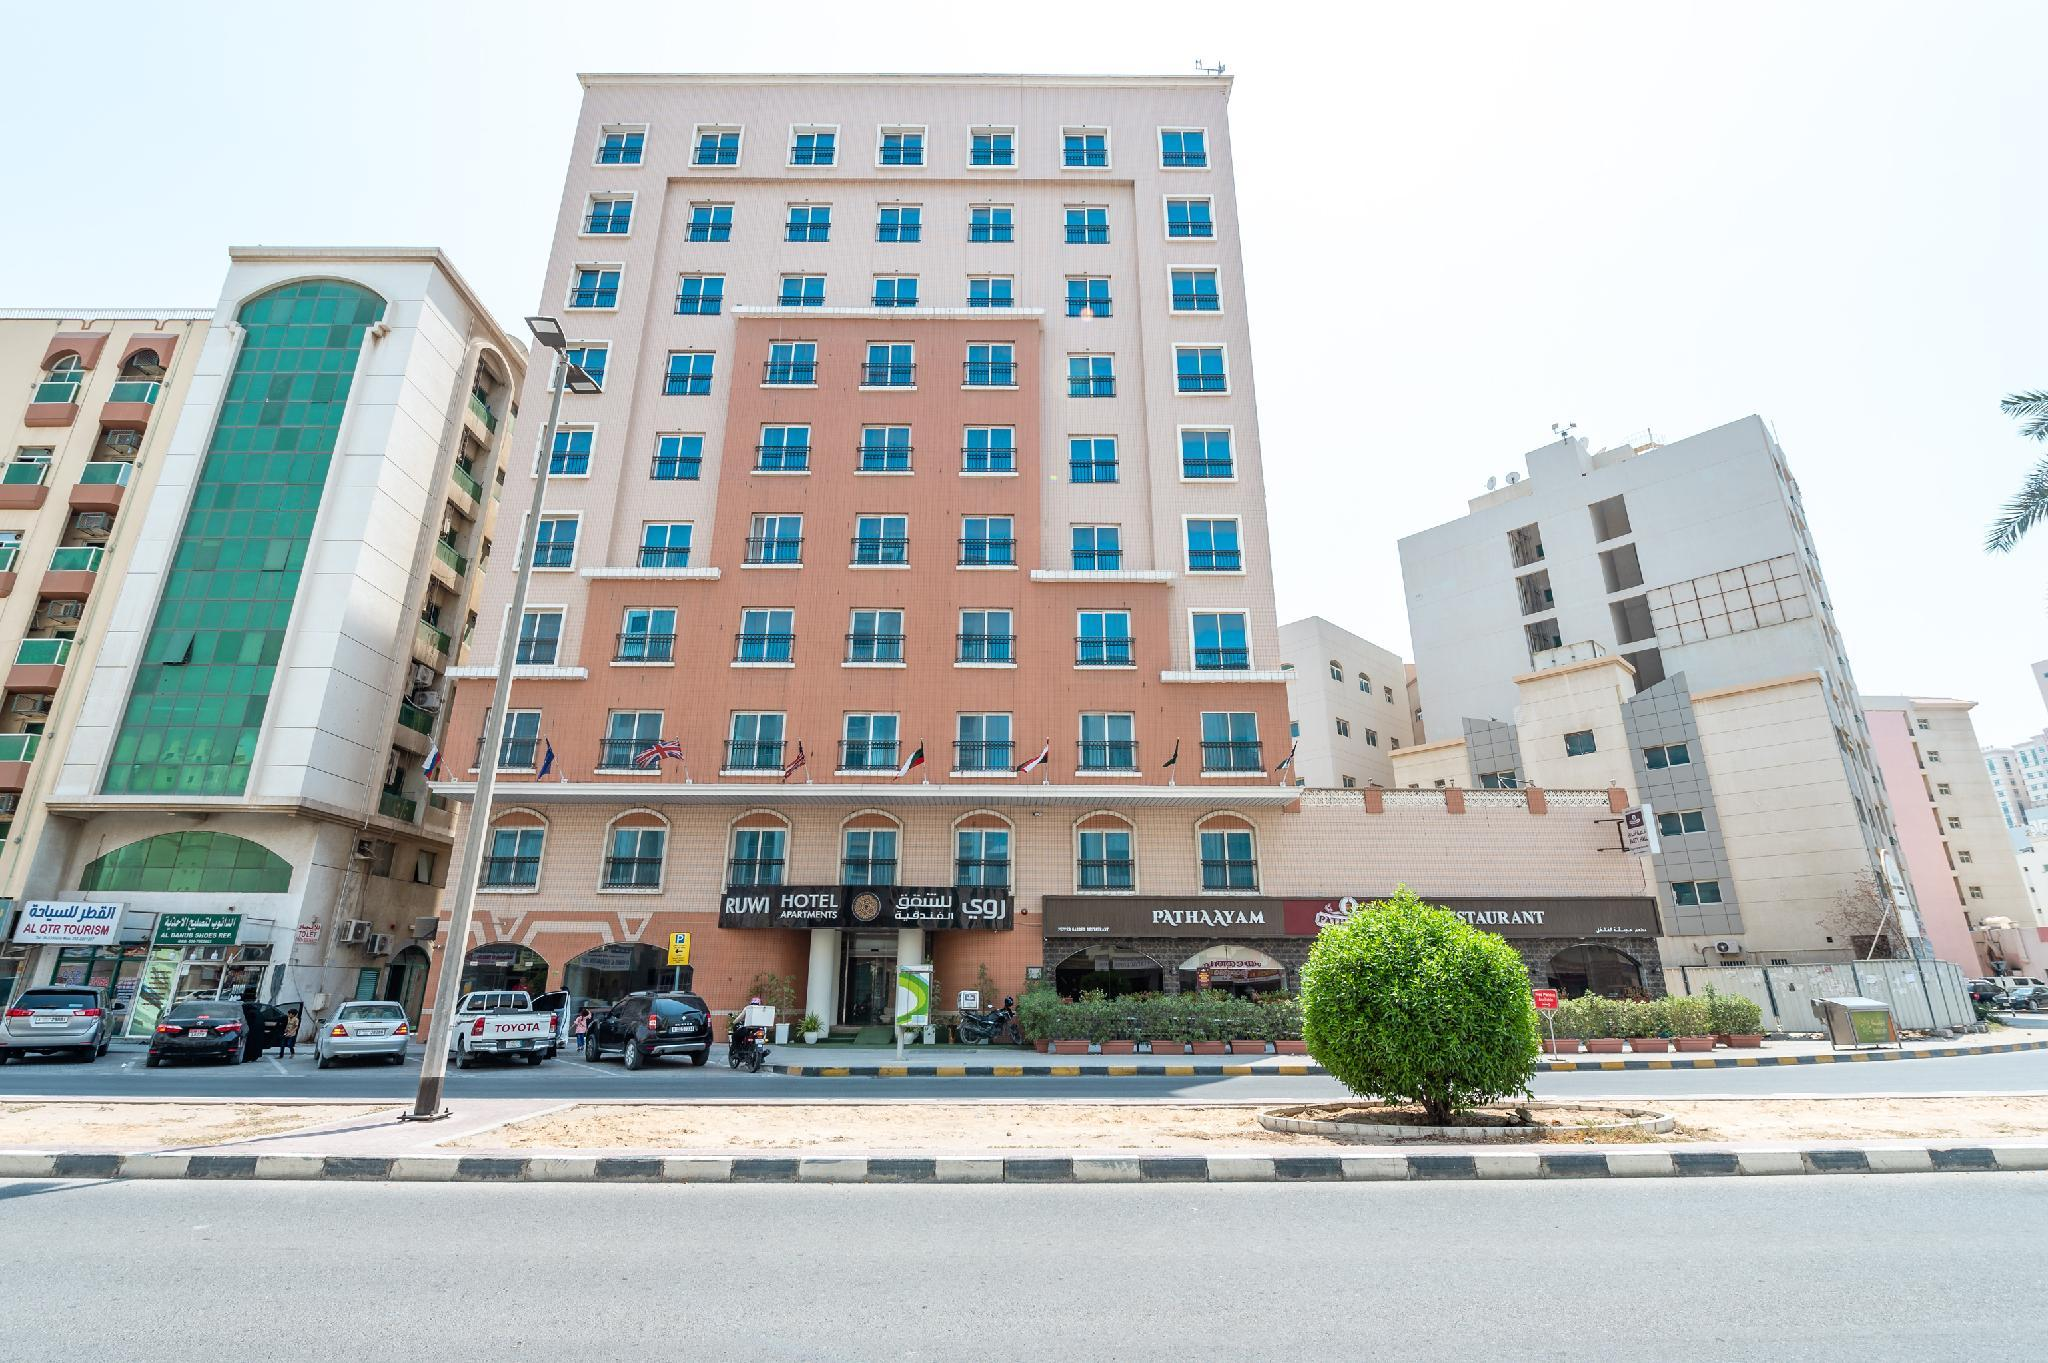 OYO 132 Ruwi Hotel Apartments – Sharjah 5